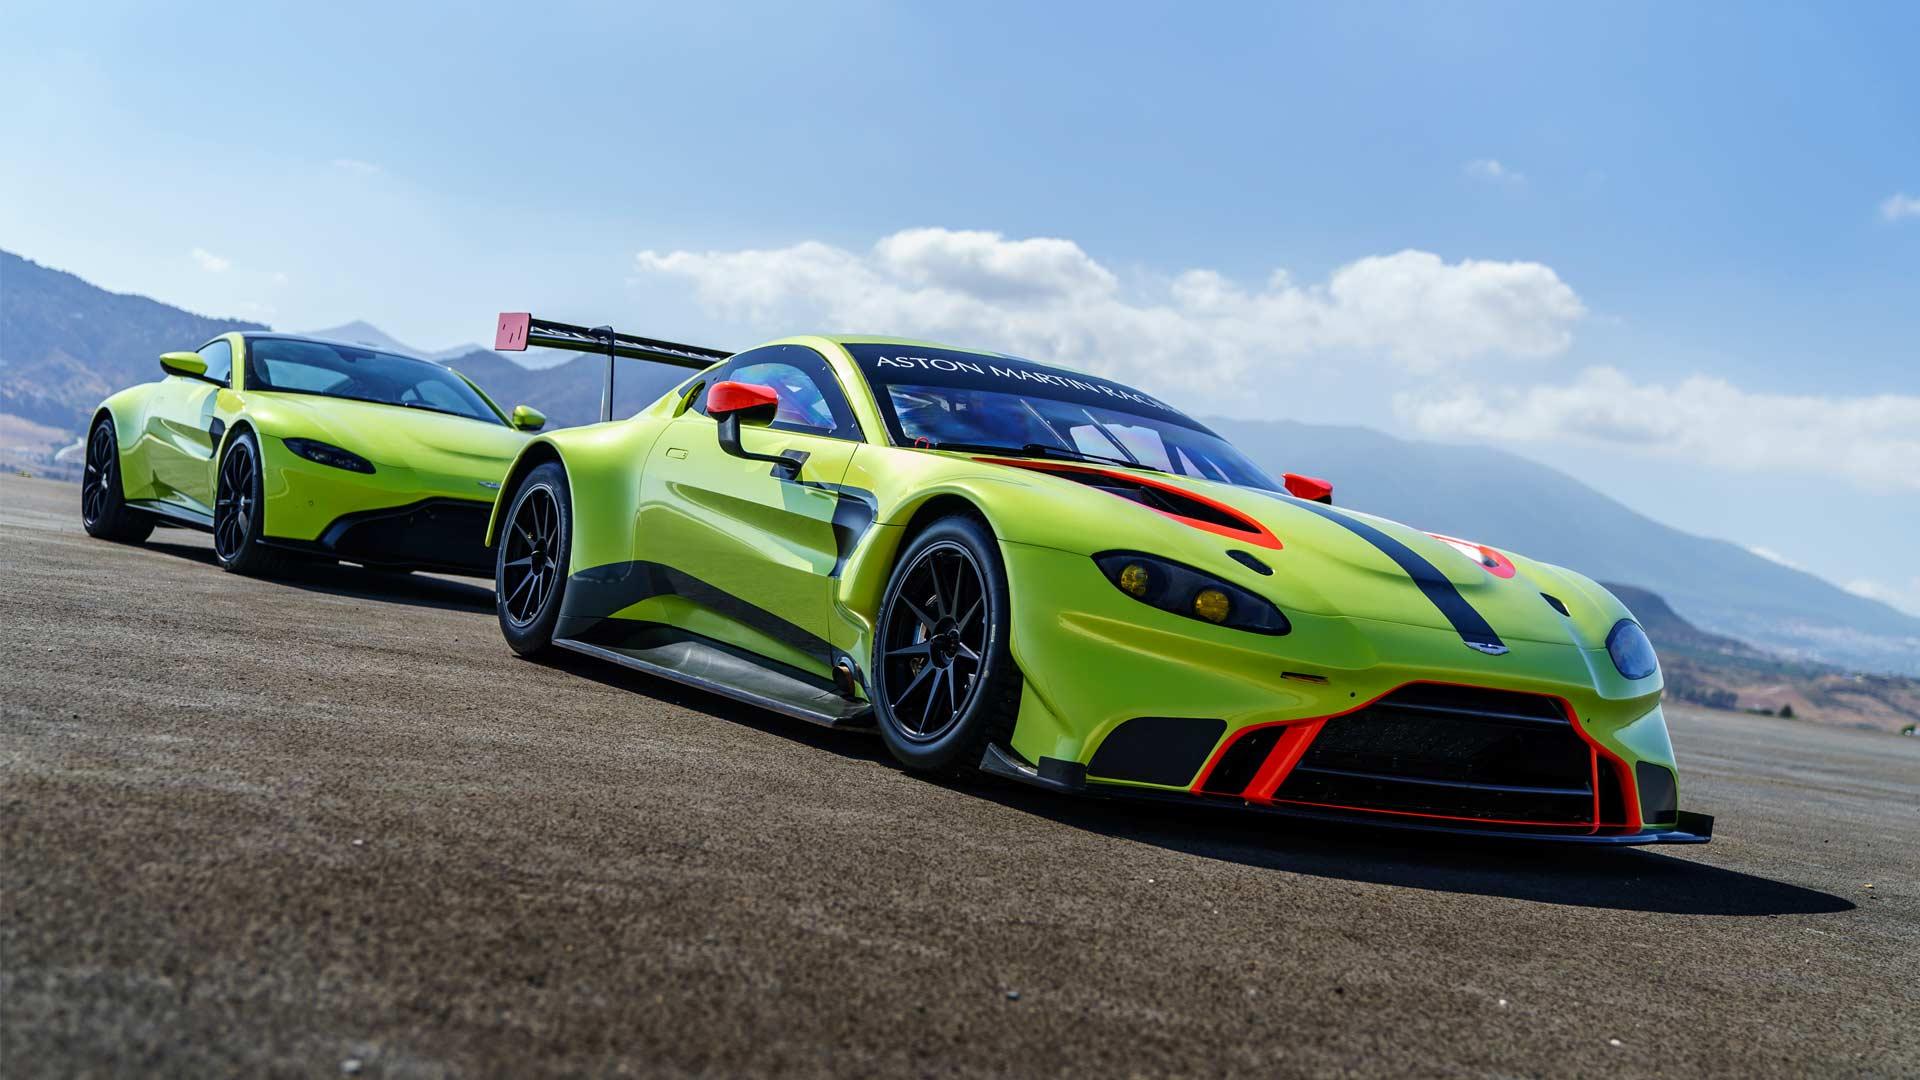 2018 Aston Martin Vantage Gte Ready For Endurance Autodevot